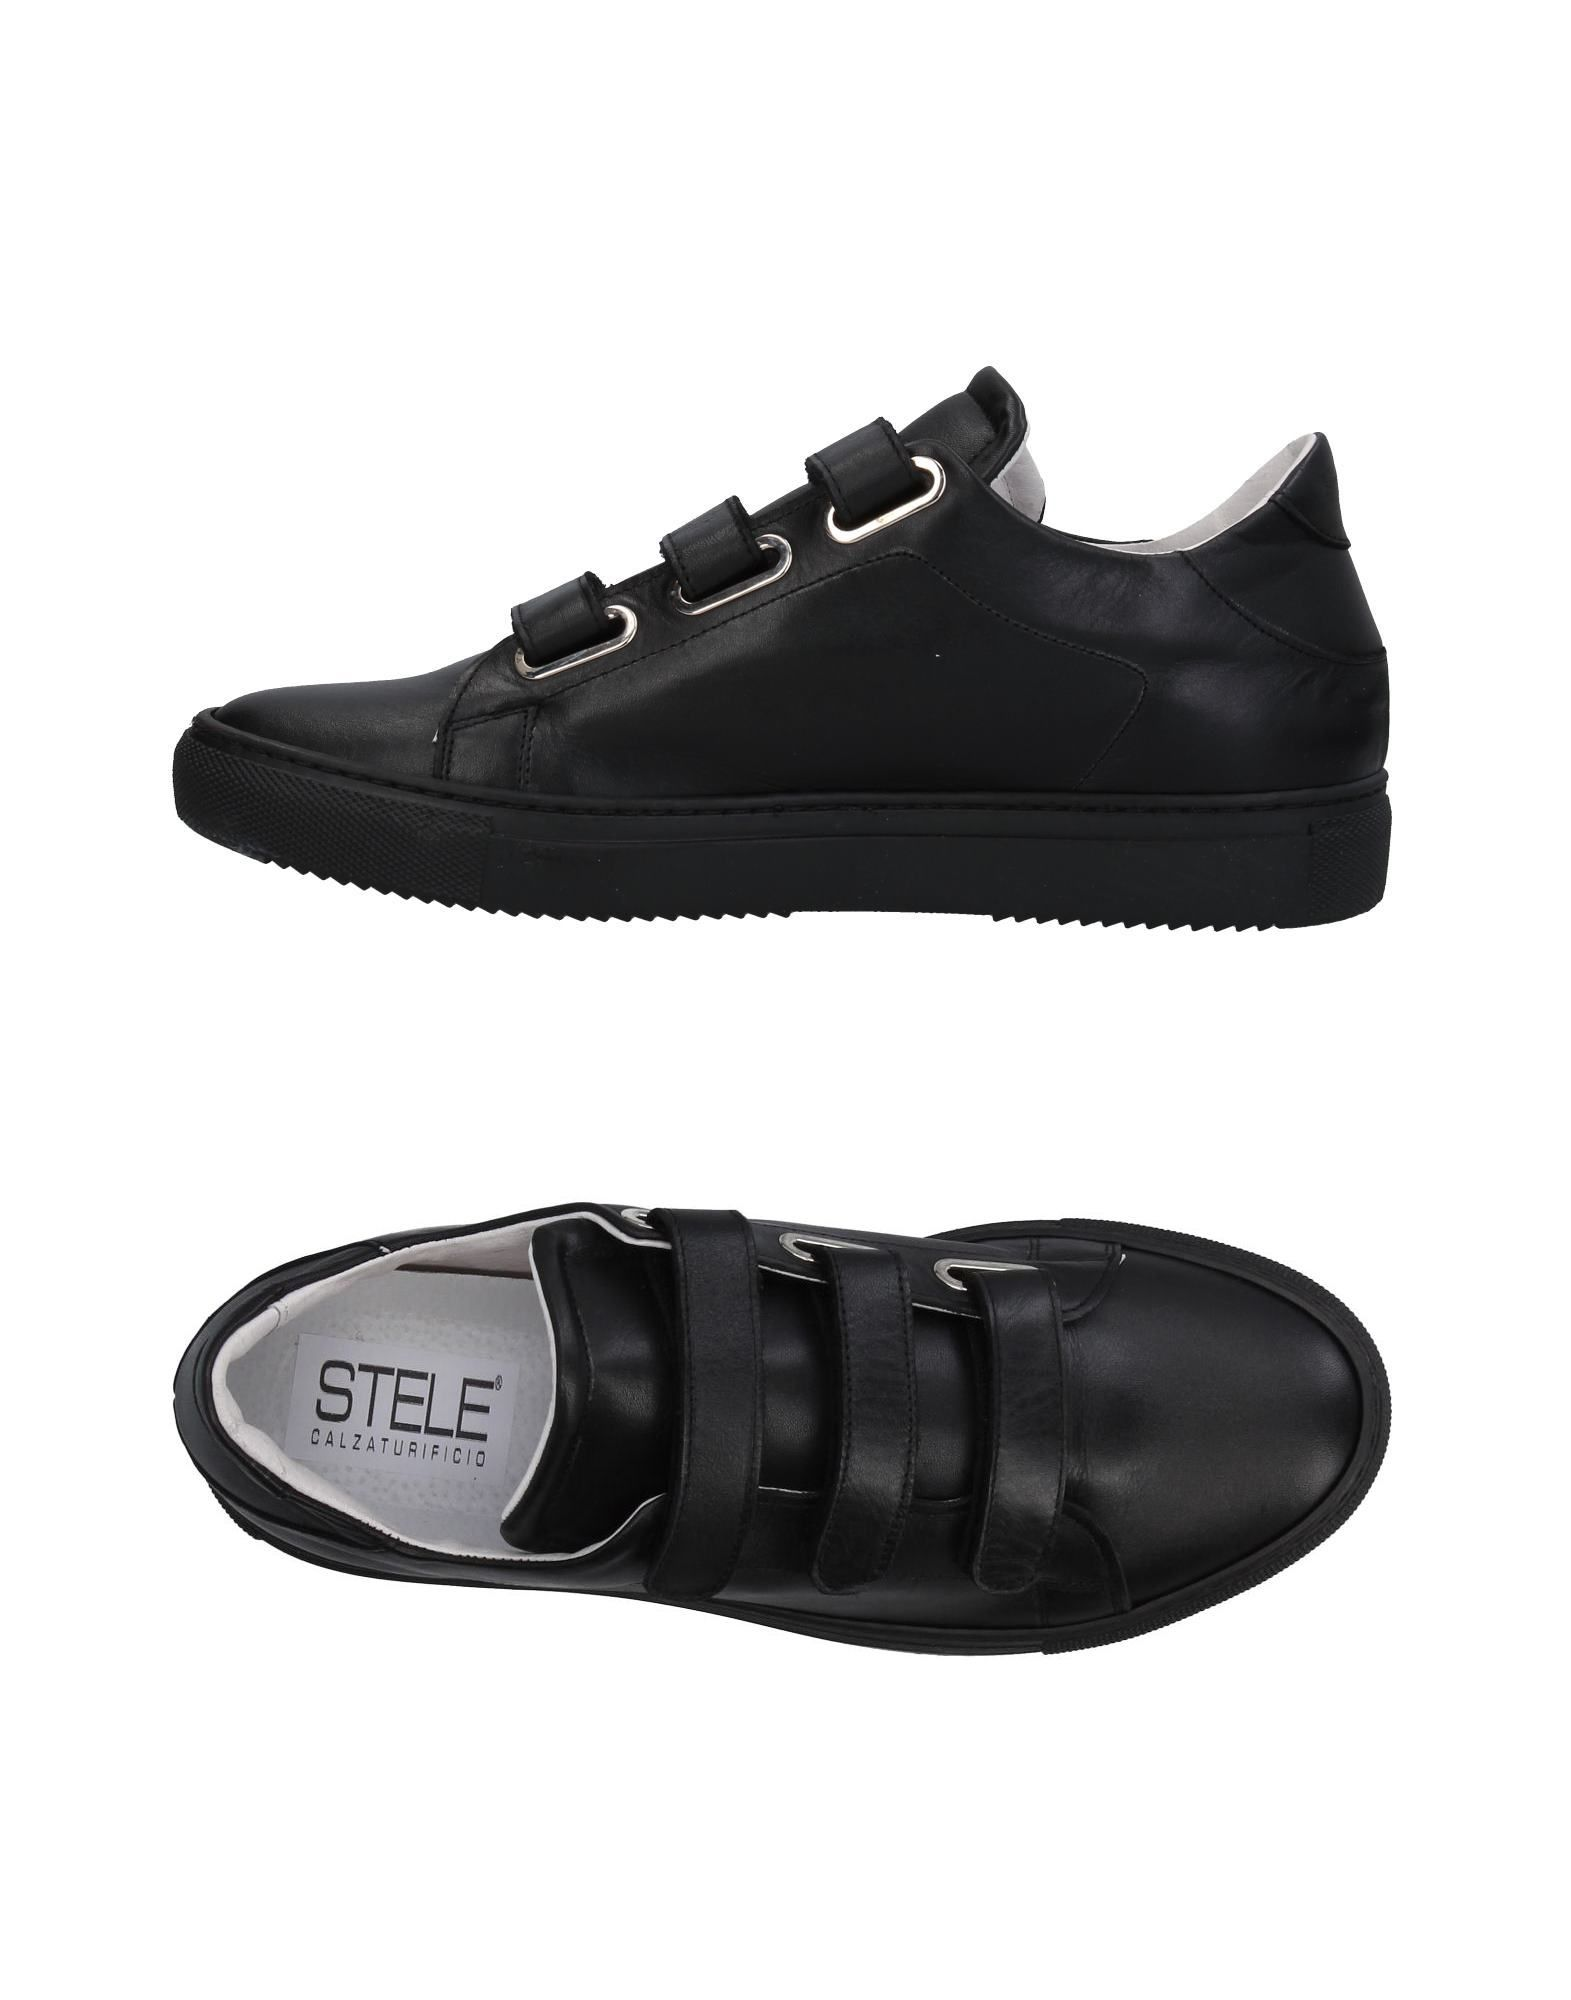 Sneakers Stele Donna - Acquista online su